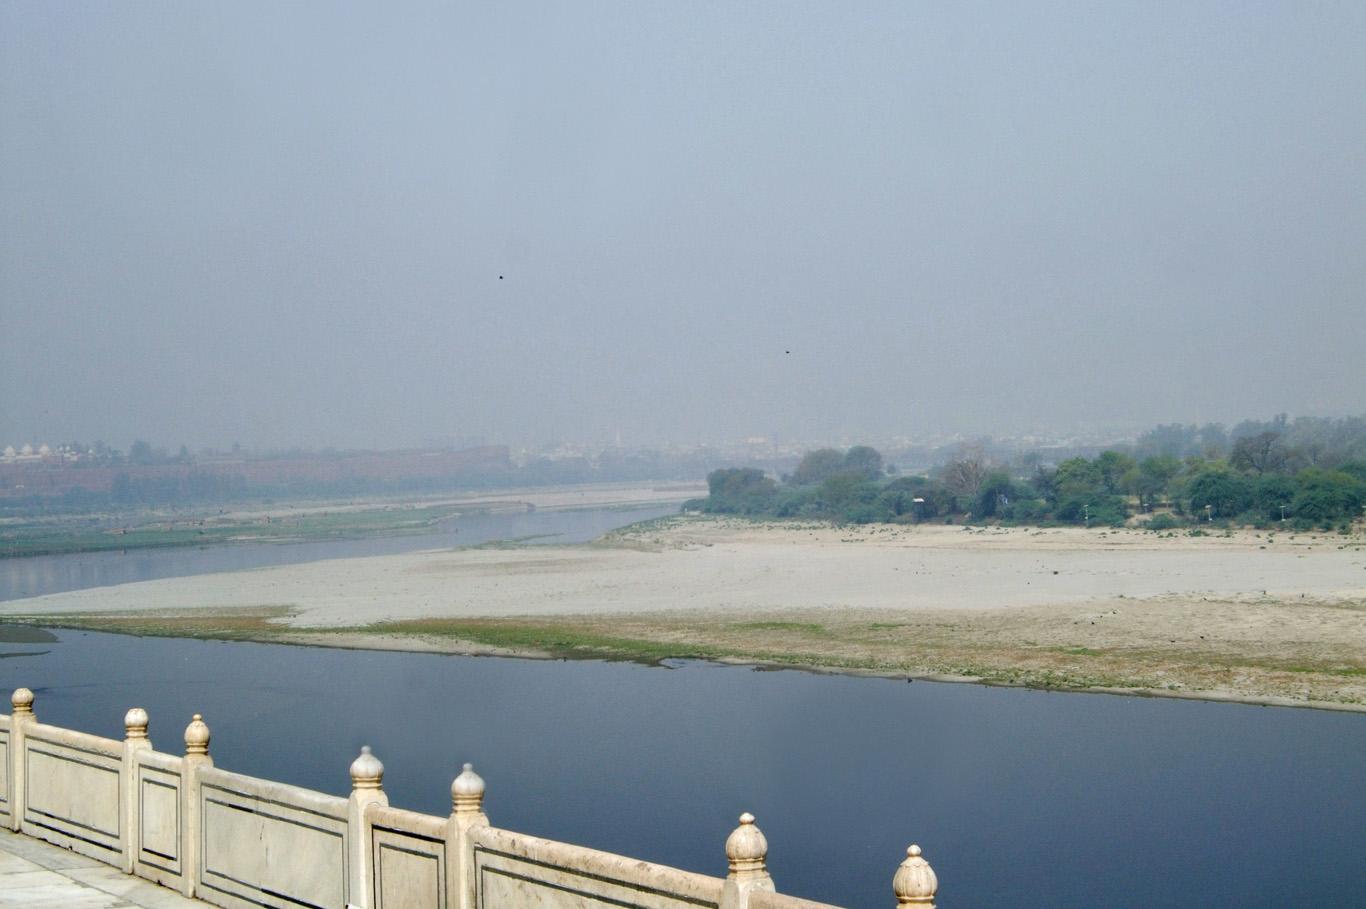 Taj Mahal - view of Agra - pollution